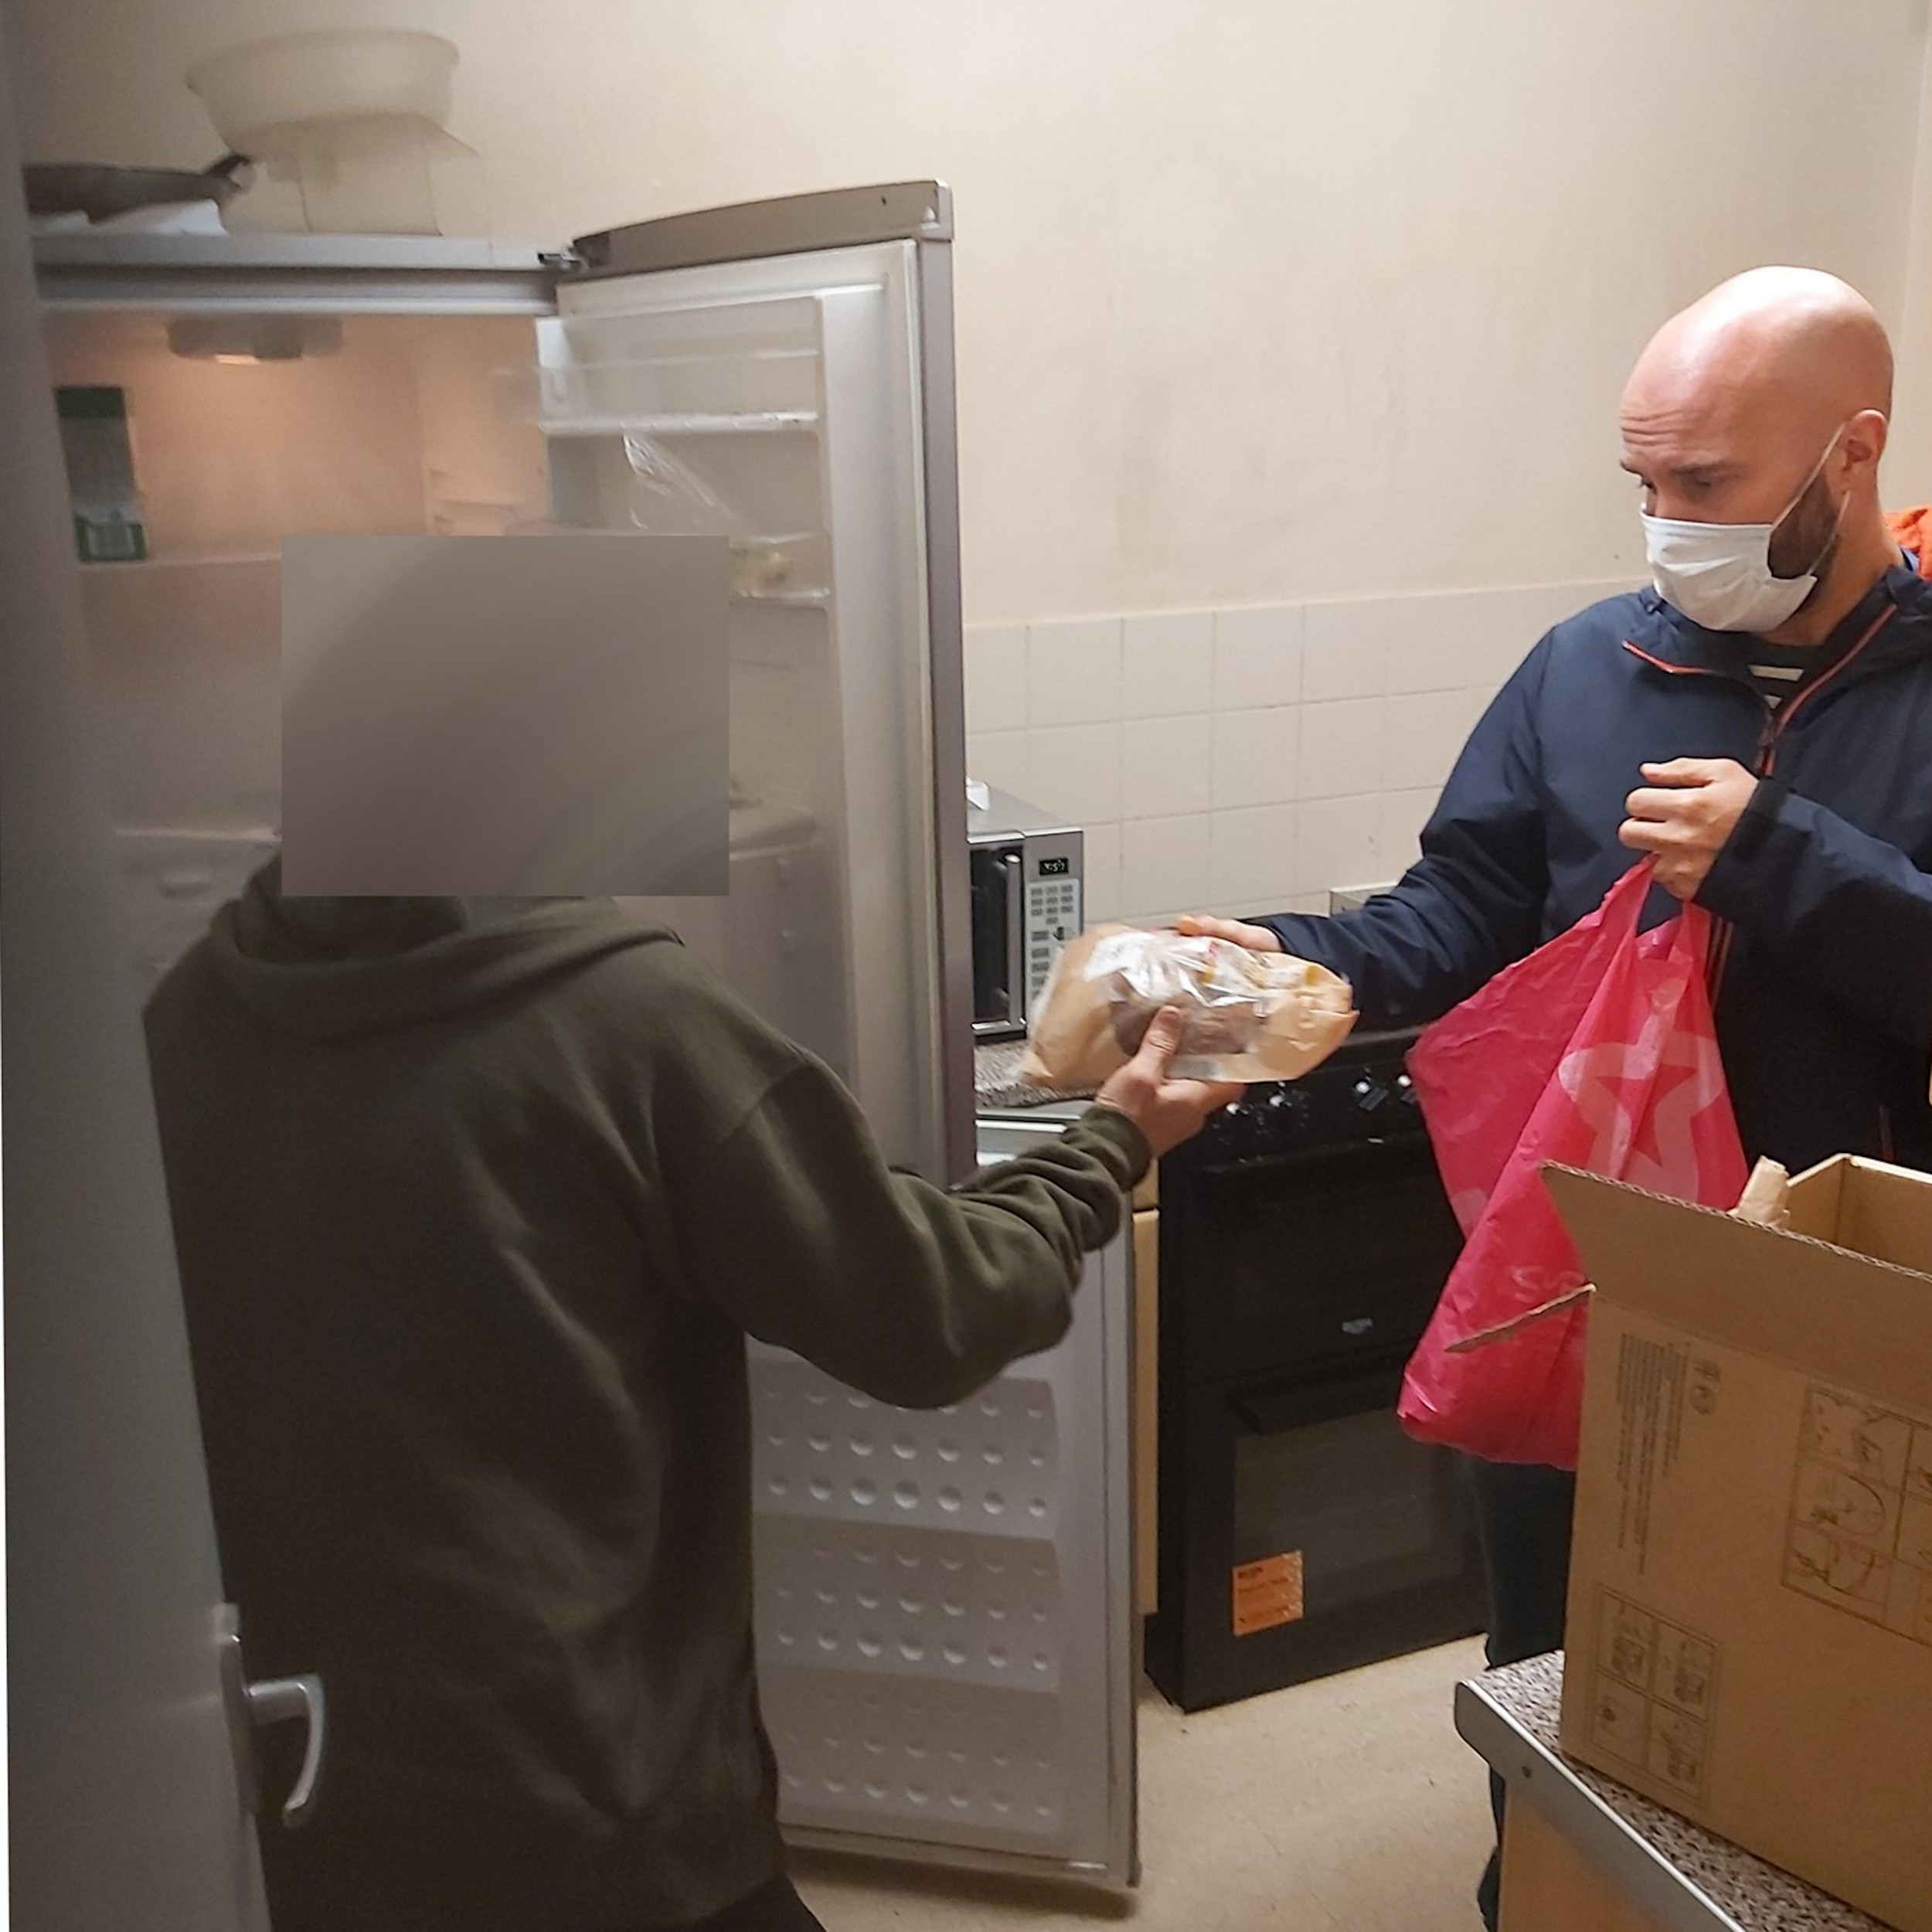 Food going into fridge